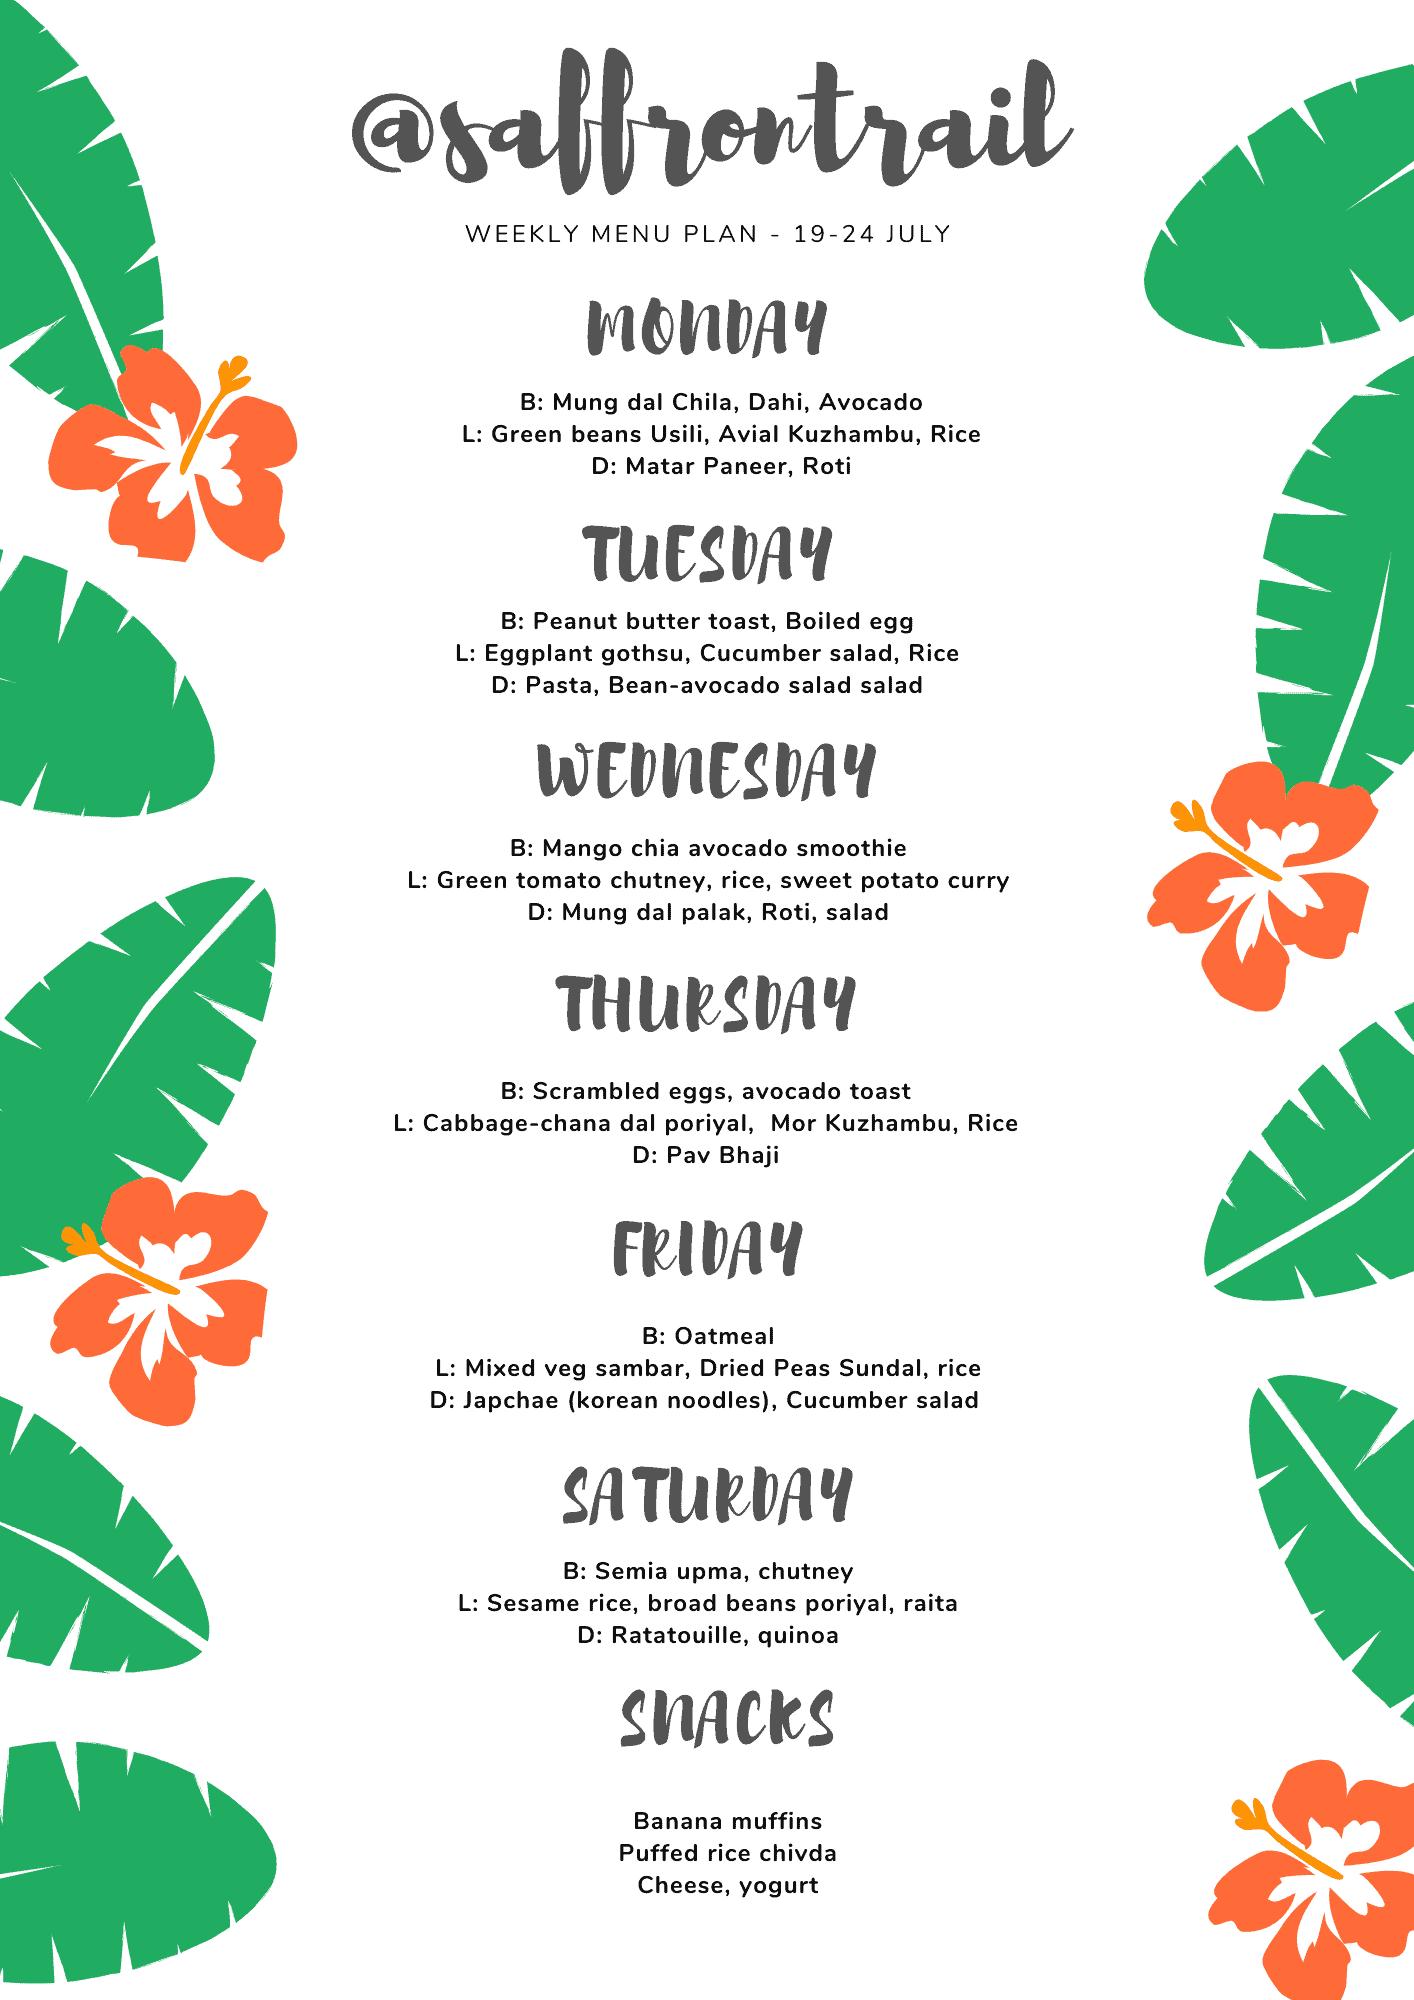 Weekly Menu Plan - Healthy Vegetarian   Saffron Trail